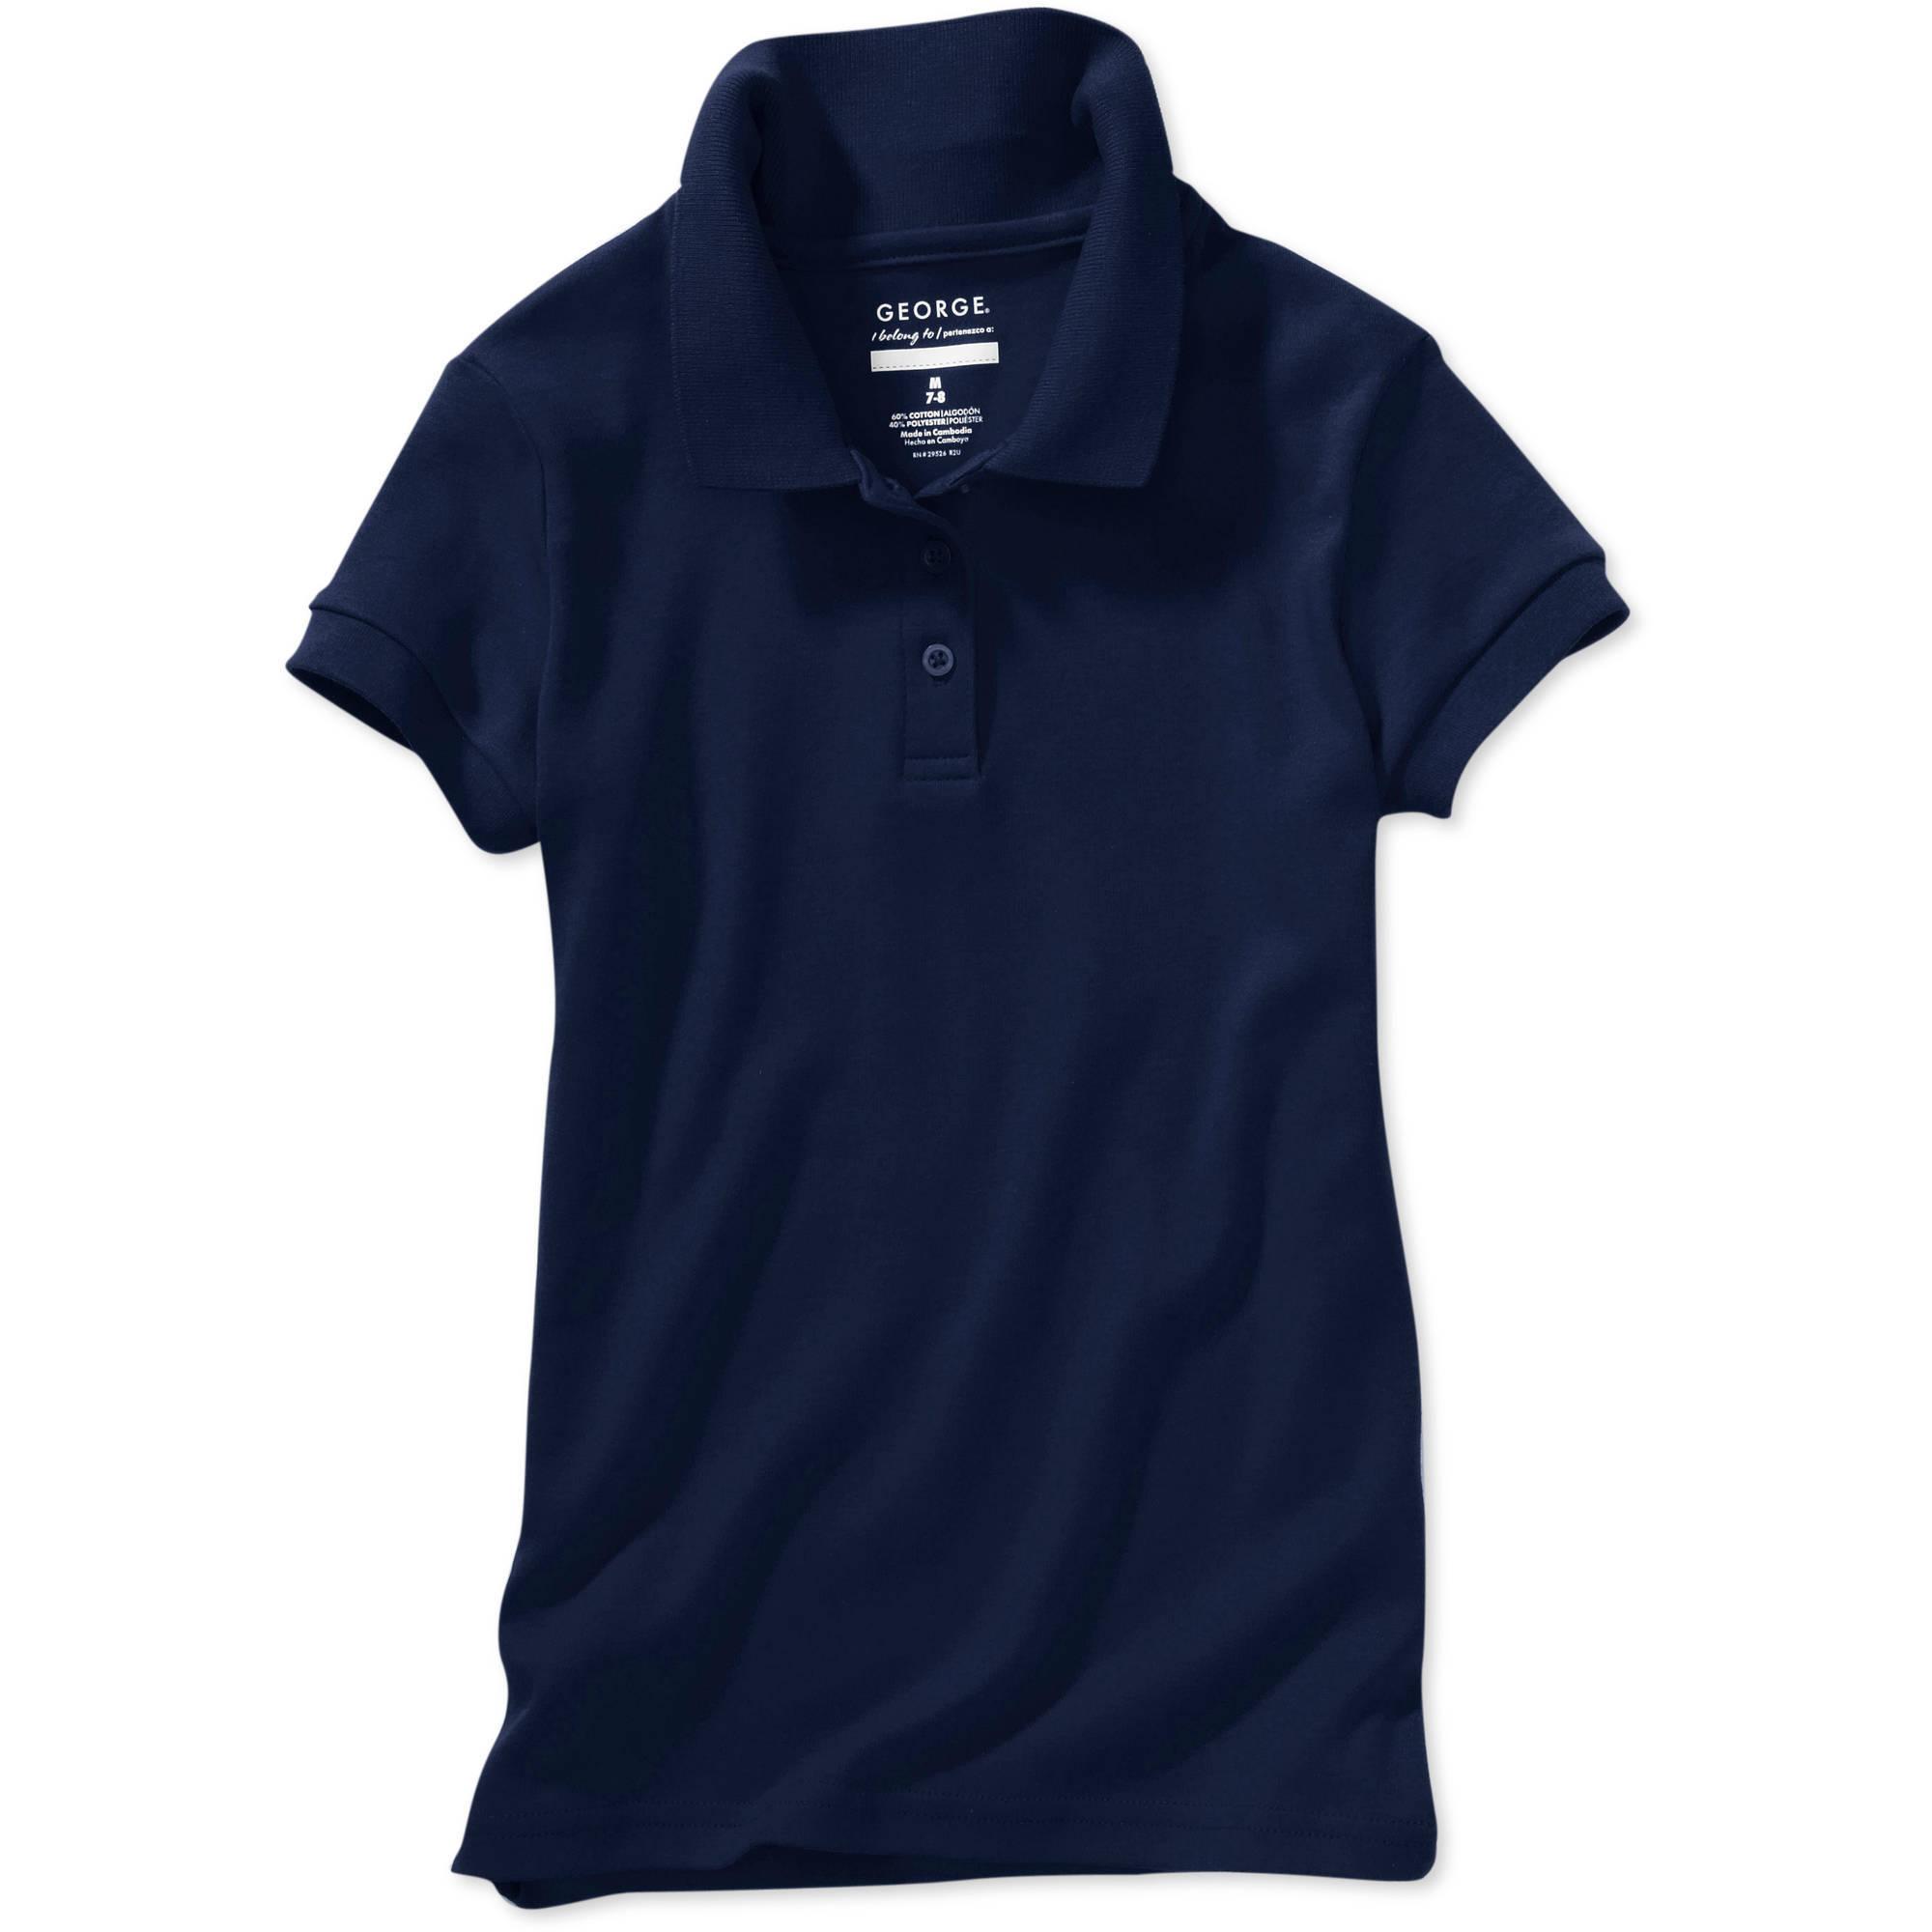 George School Uniform Girls Plus Size Short Sleeve Polo Shirt With Scotchgard Stain Resistant Treatment